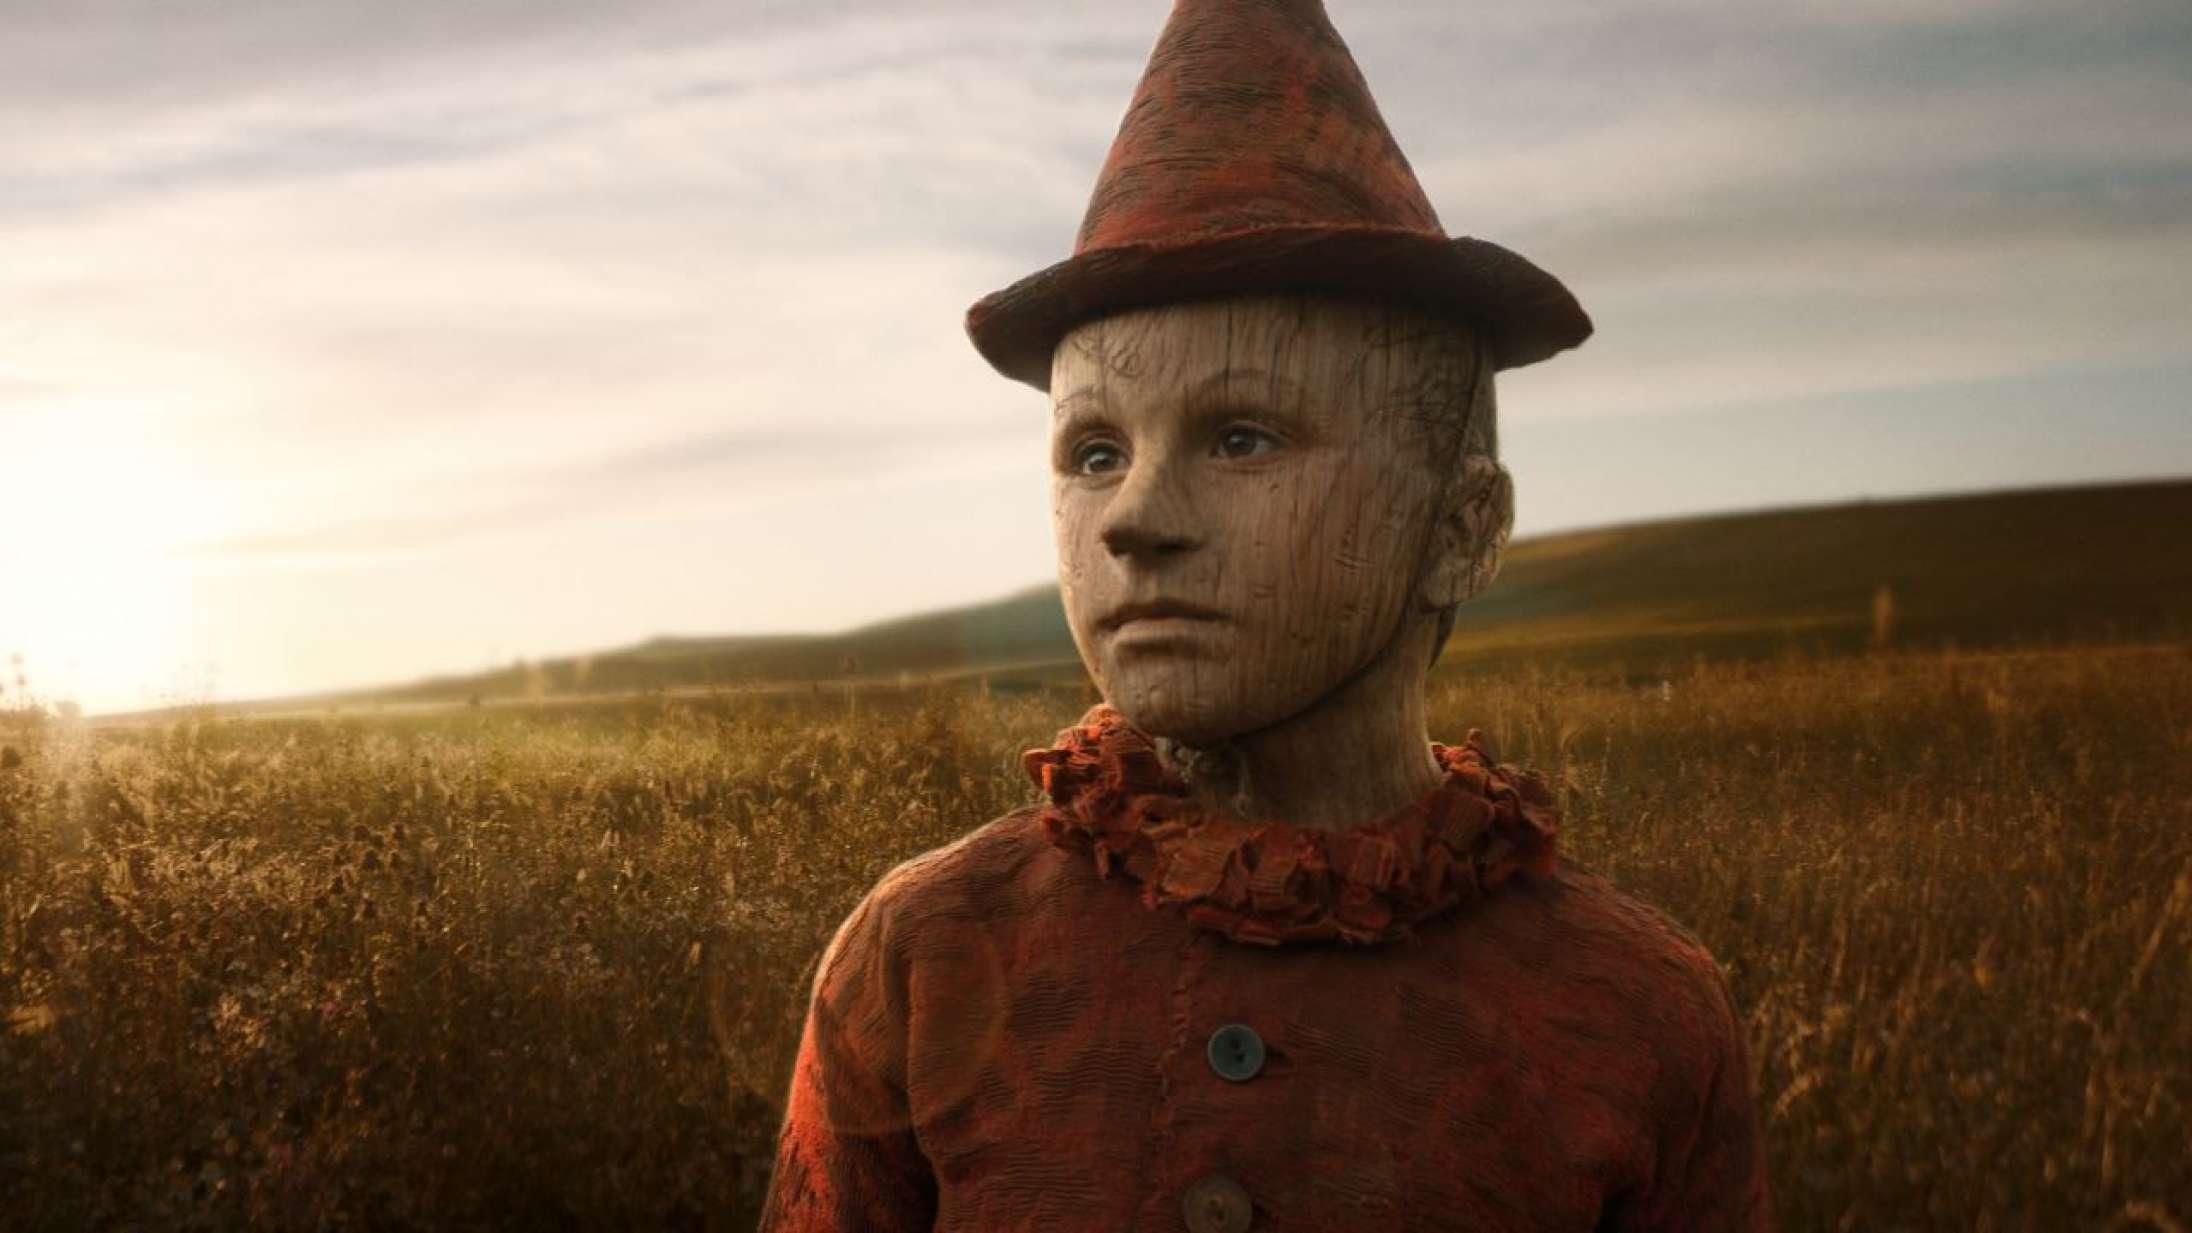 'Pinocchio': Et miskmask af socialrealisme, CGI-dyr og Roberto Benigni